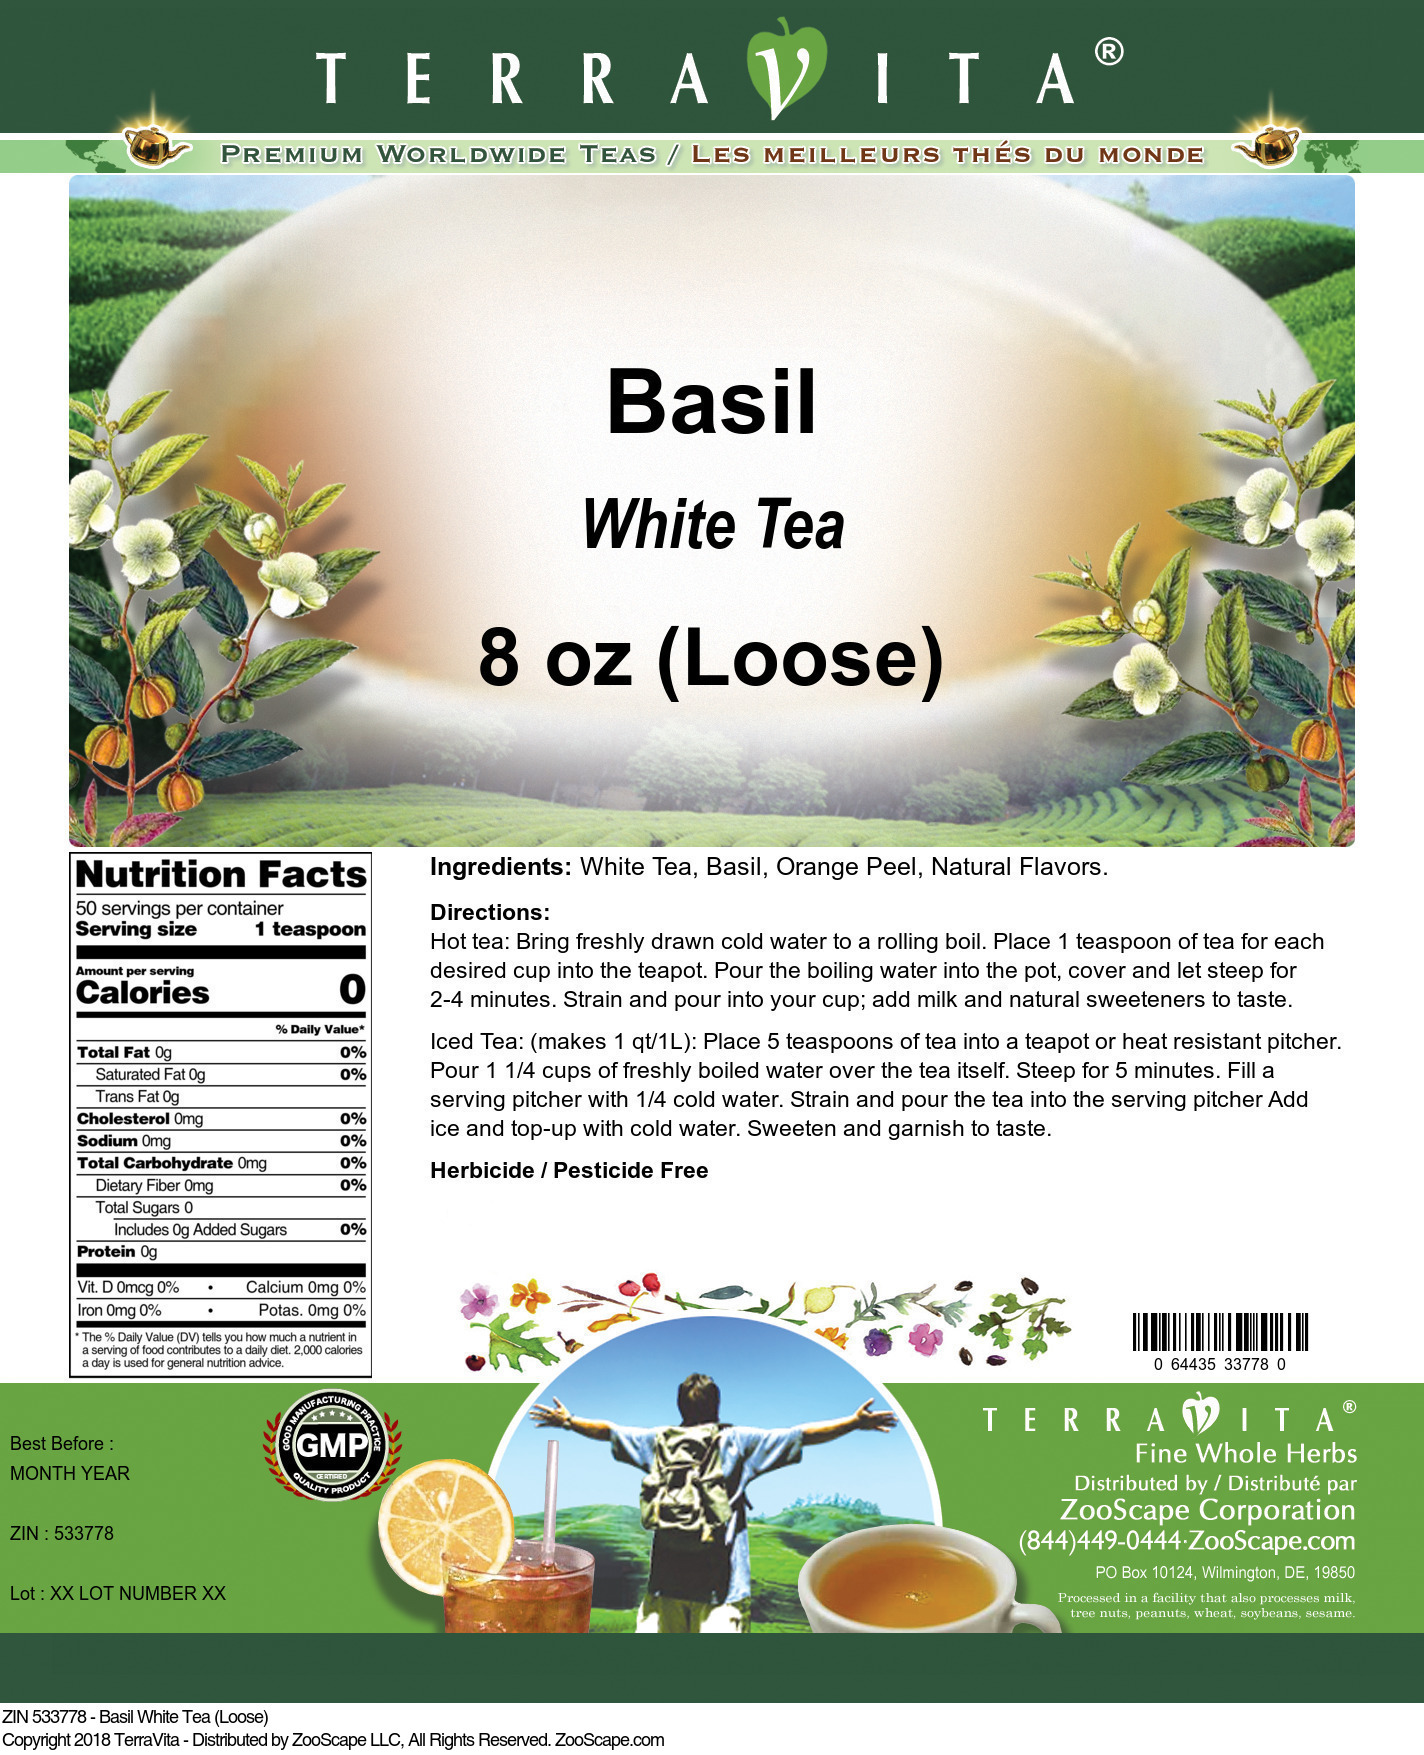 Basil White Tea